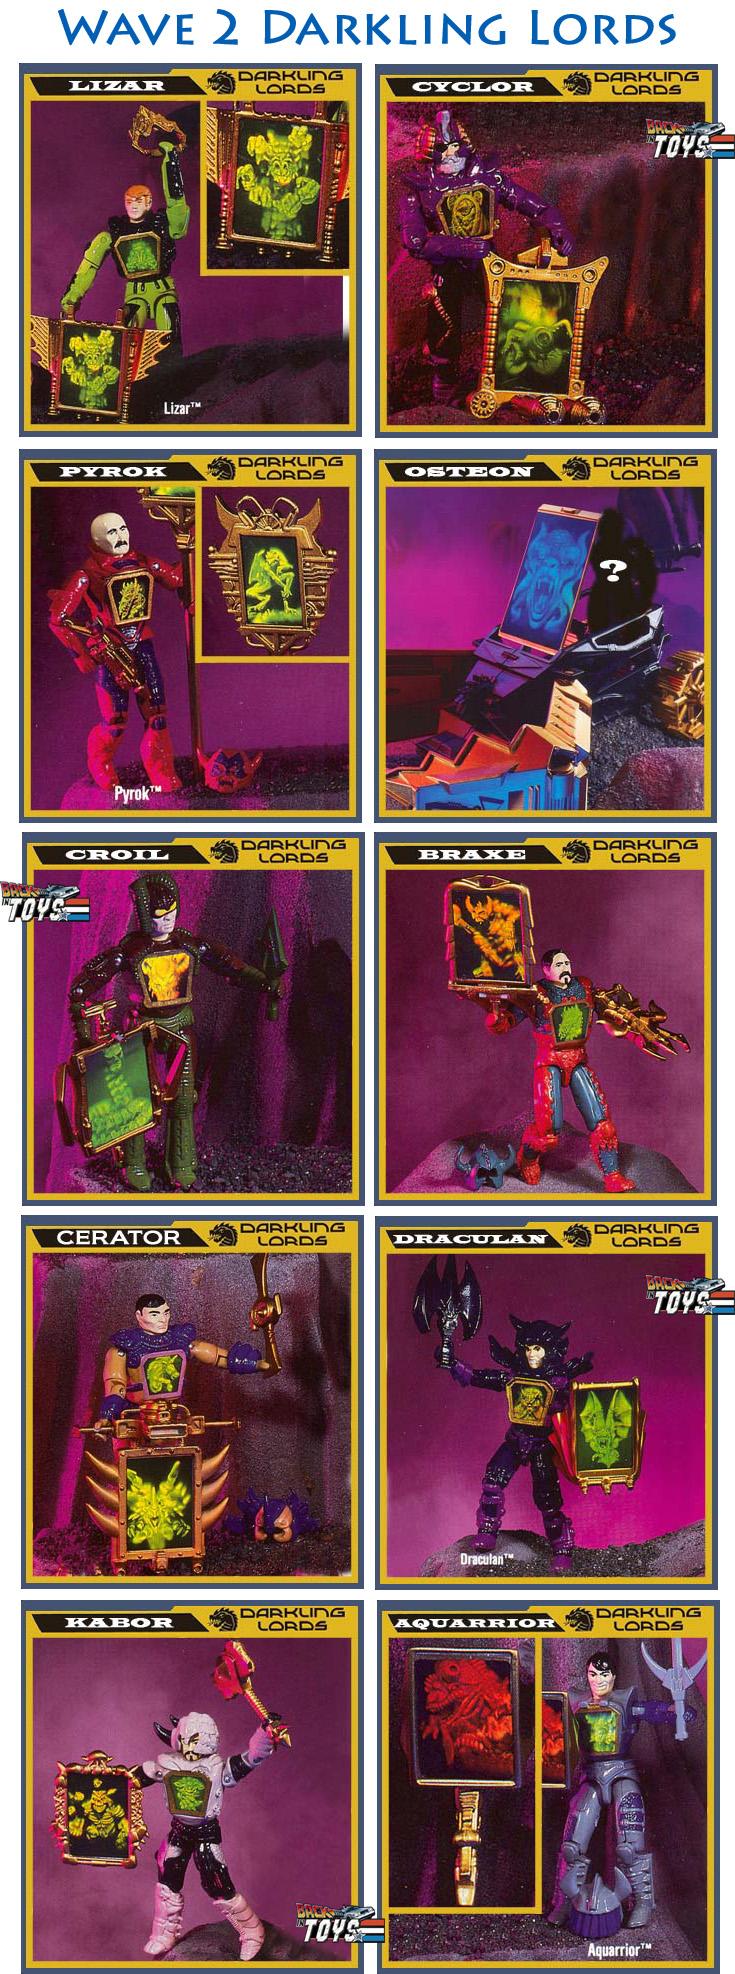 VISIONARIES (Hasbro) 1987 - Page 2 Ub4o